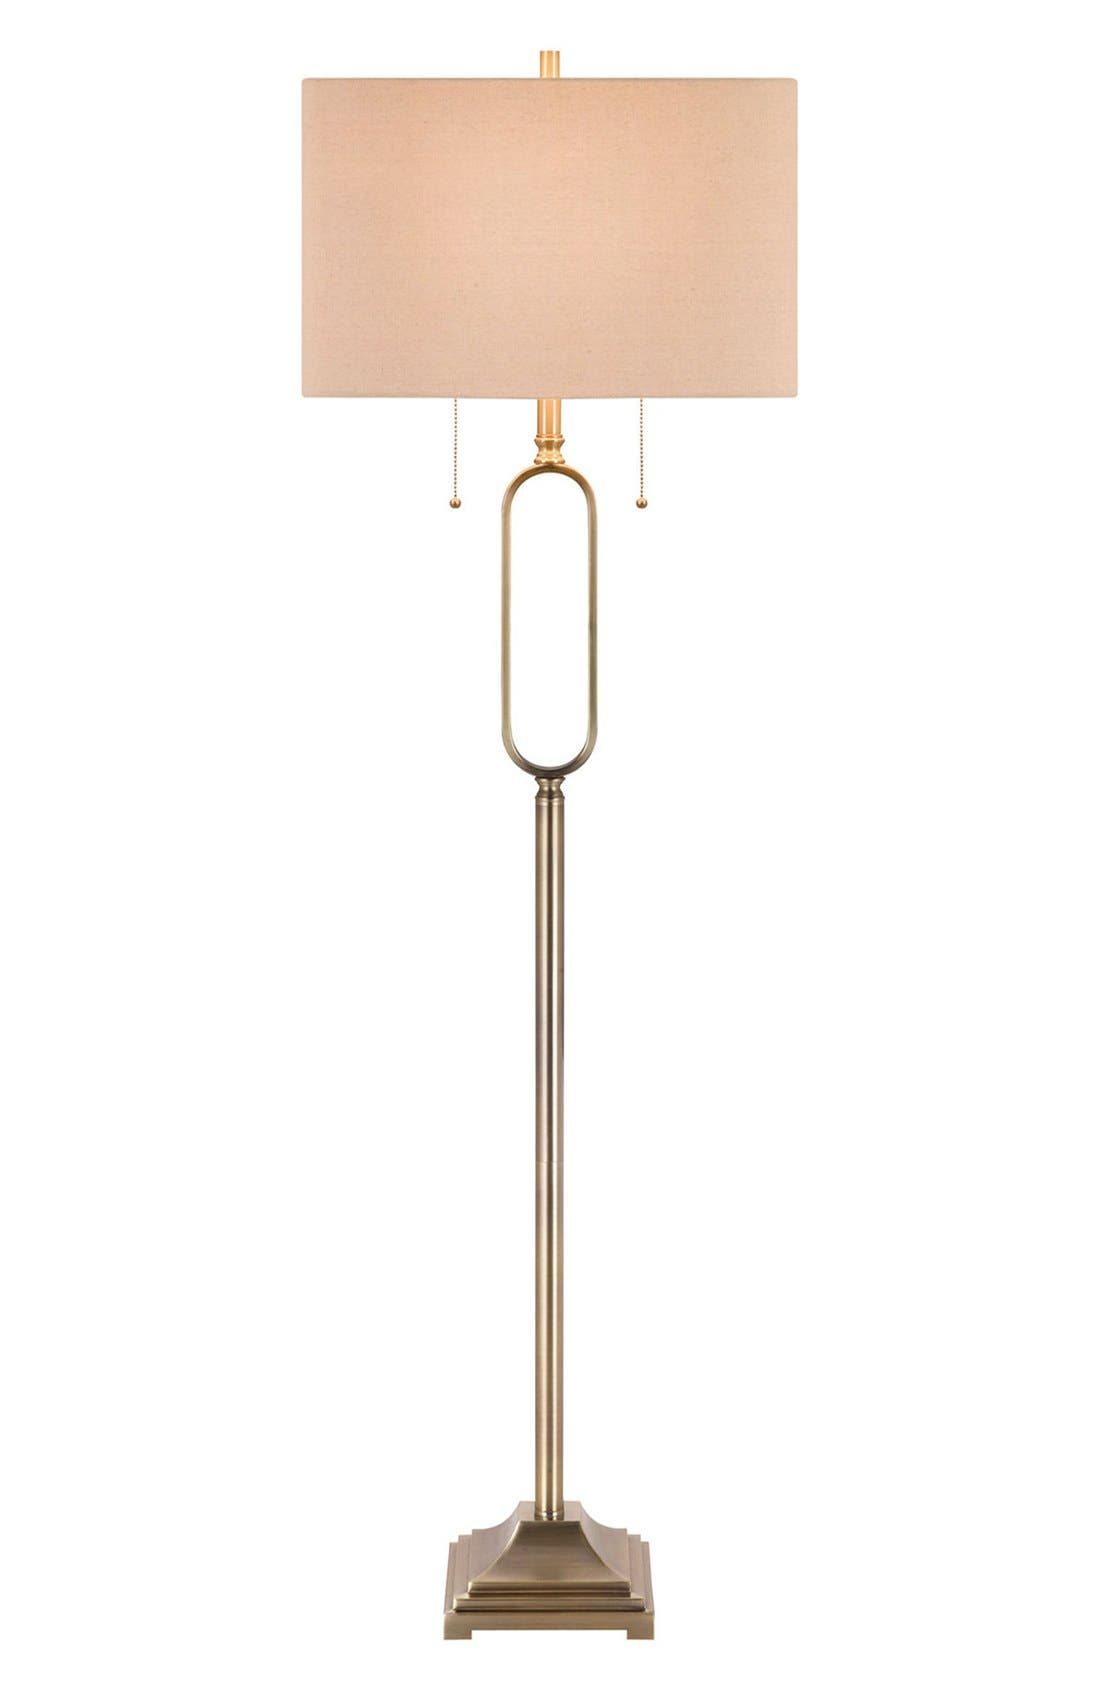 JAlexander Metal Floor Lamp,                             Main thumbnail 1, color,                             METALLIC GOLD